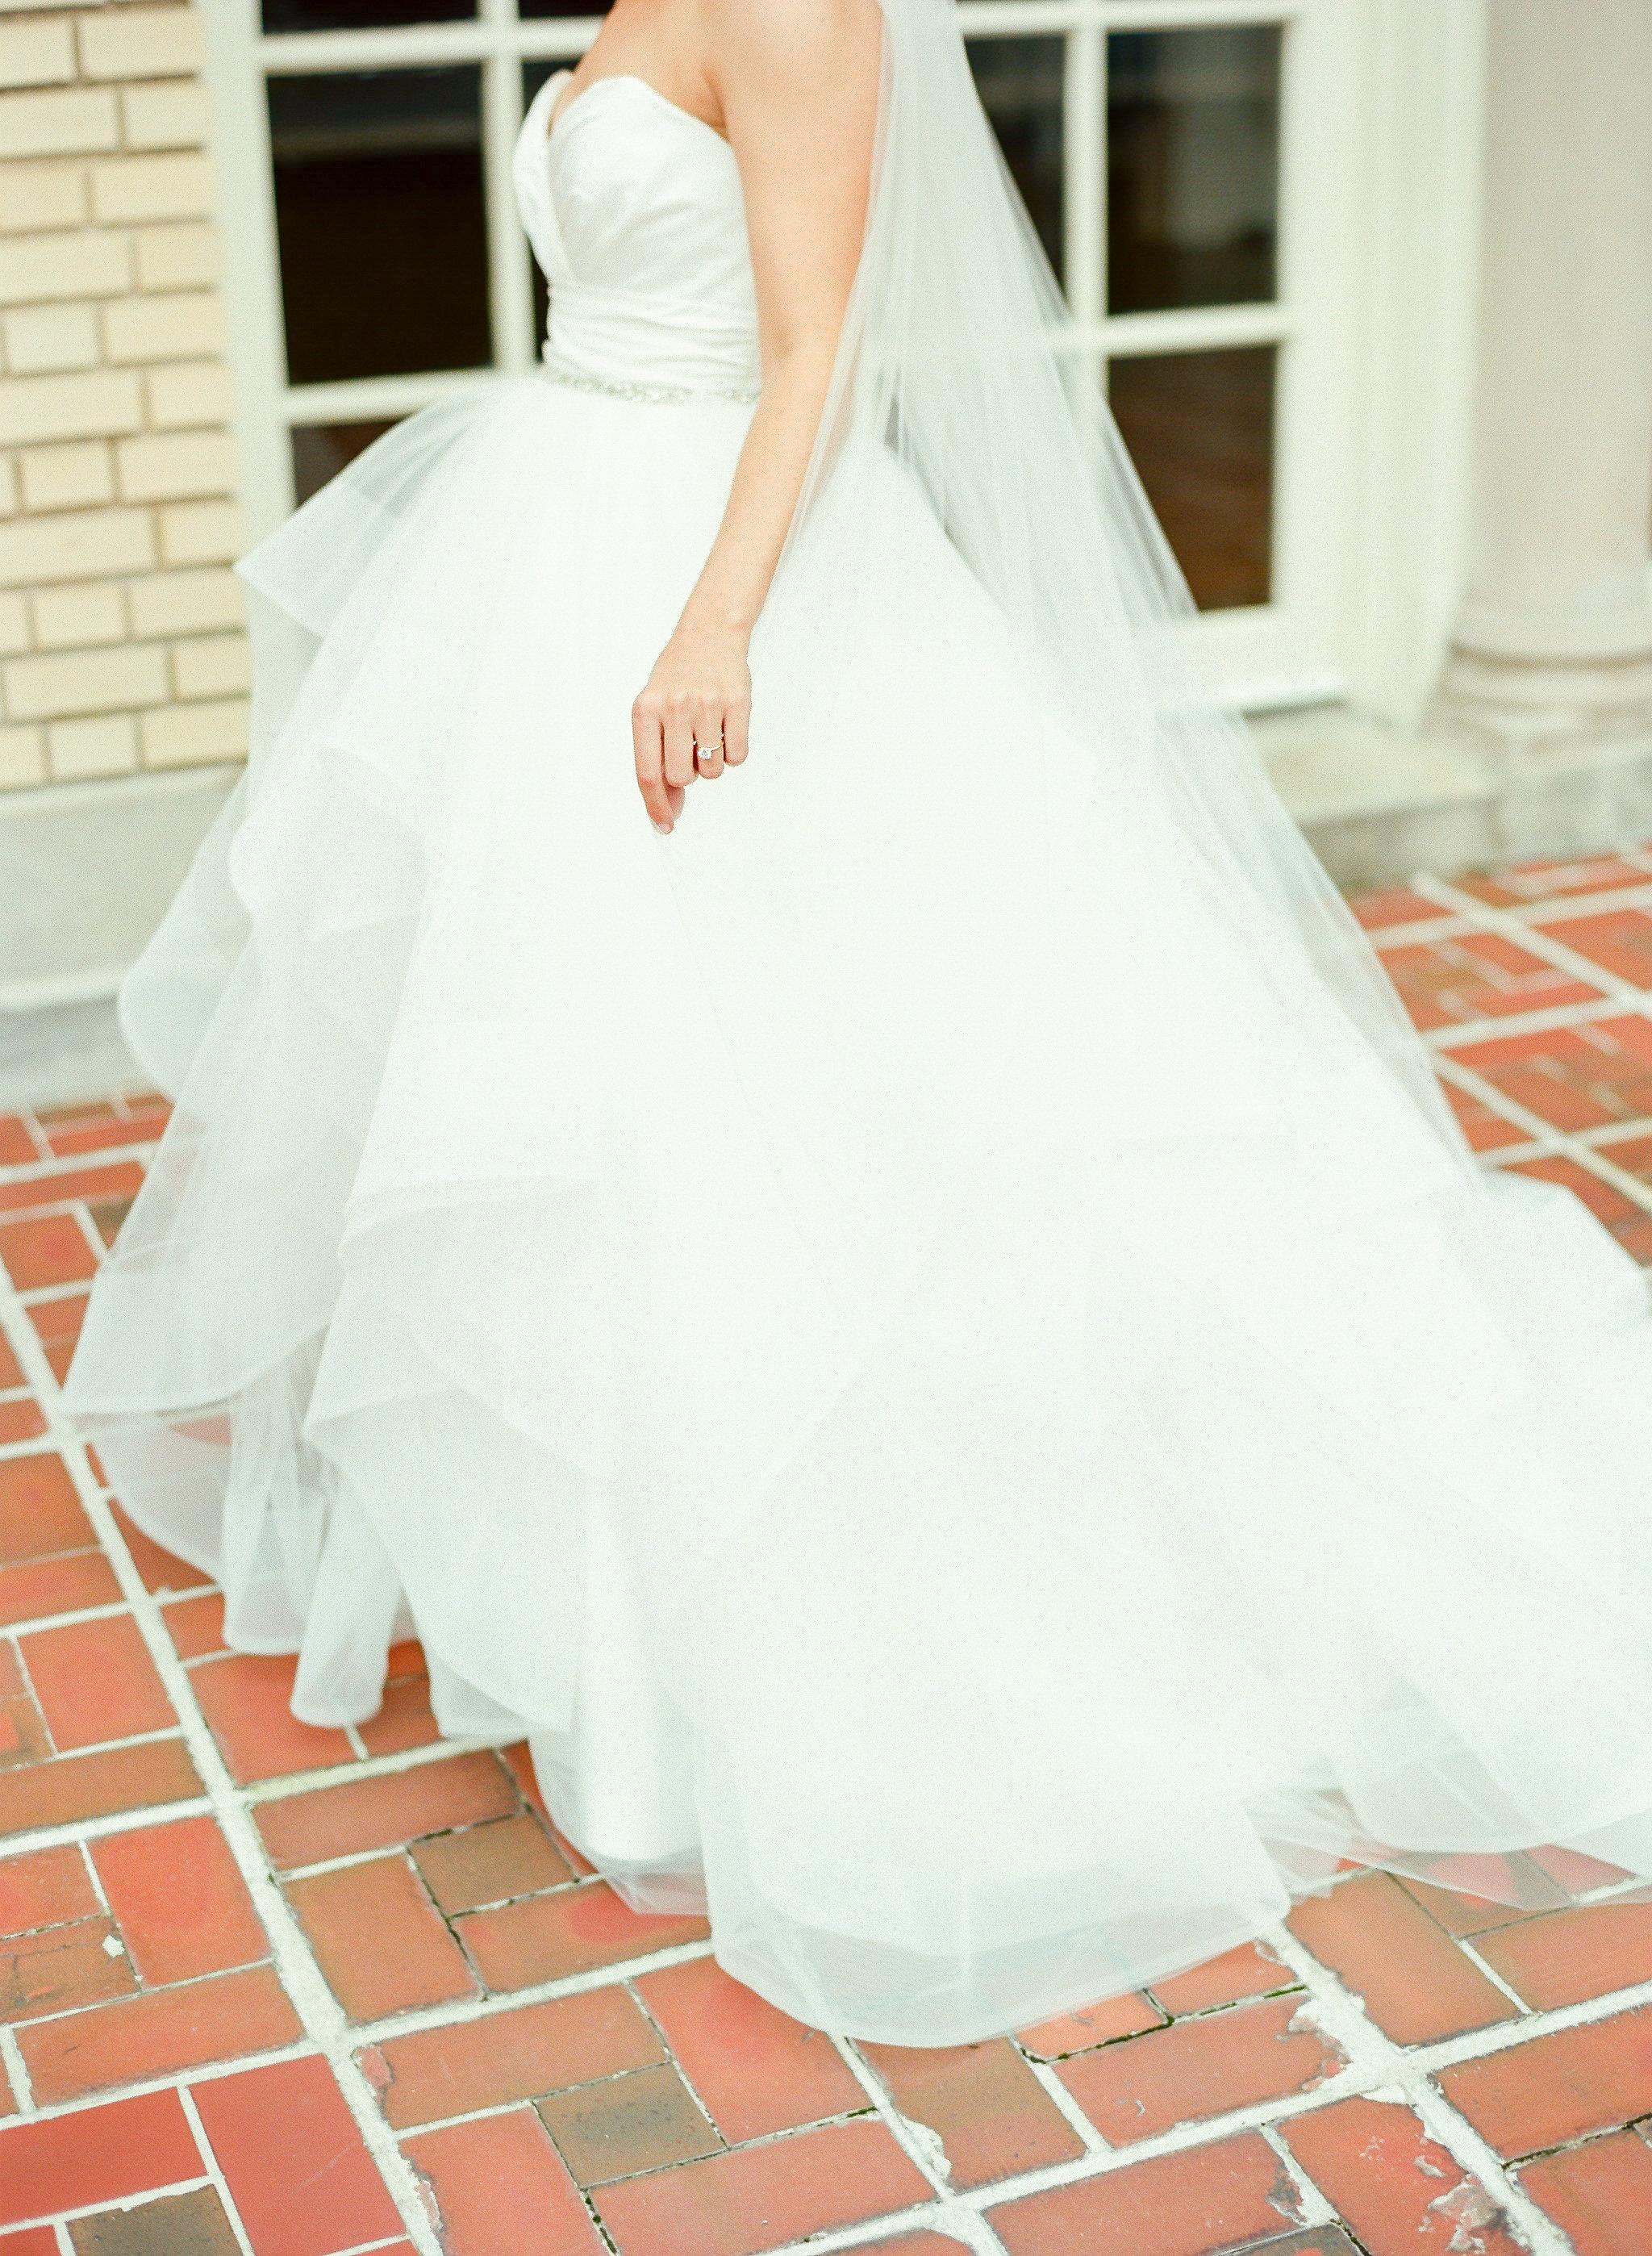 North-Carolina-Bridal-Photographer-Rebecca-4.jpg